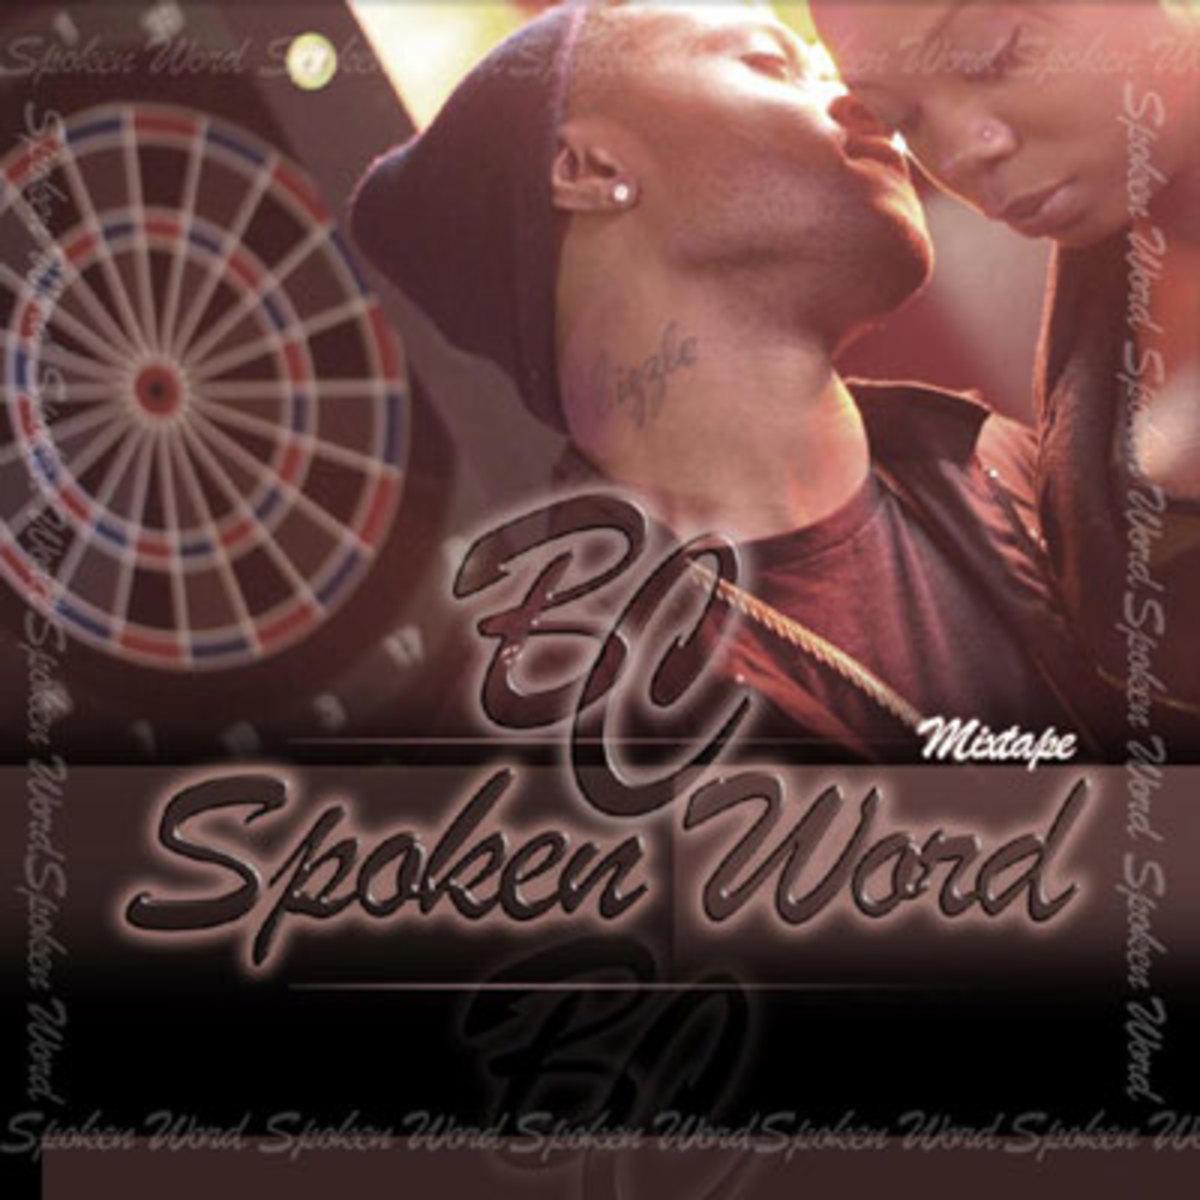 bc-spoken-word.jpg